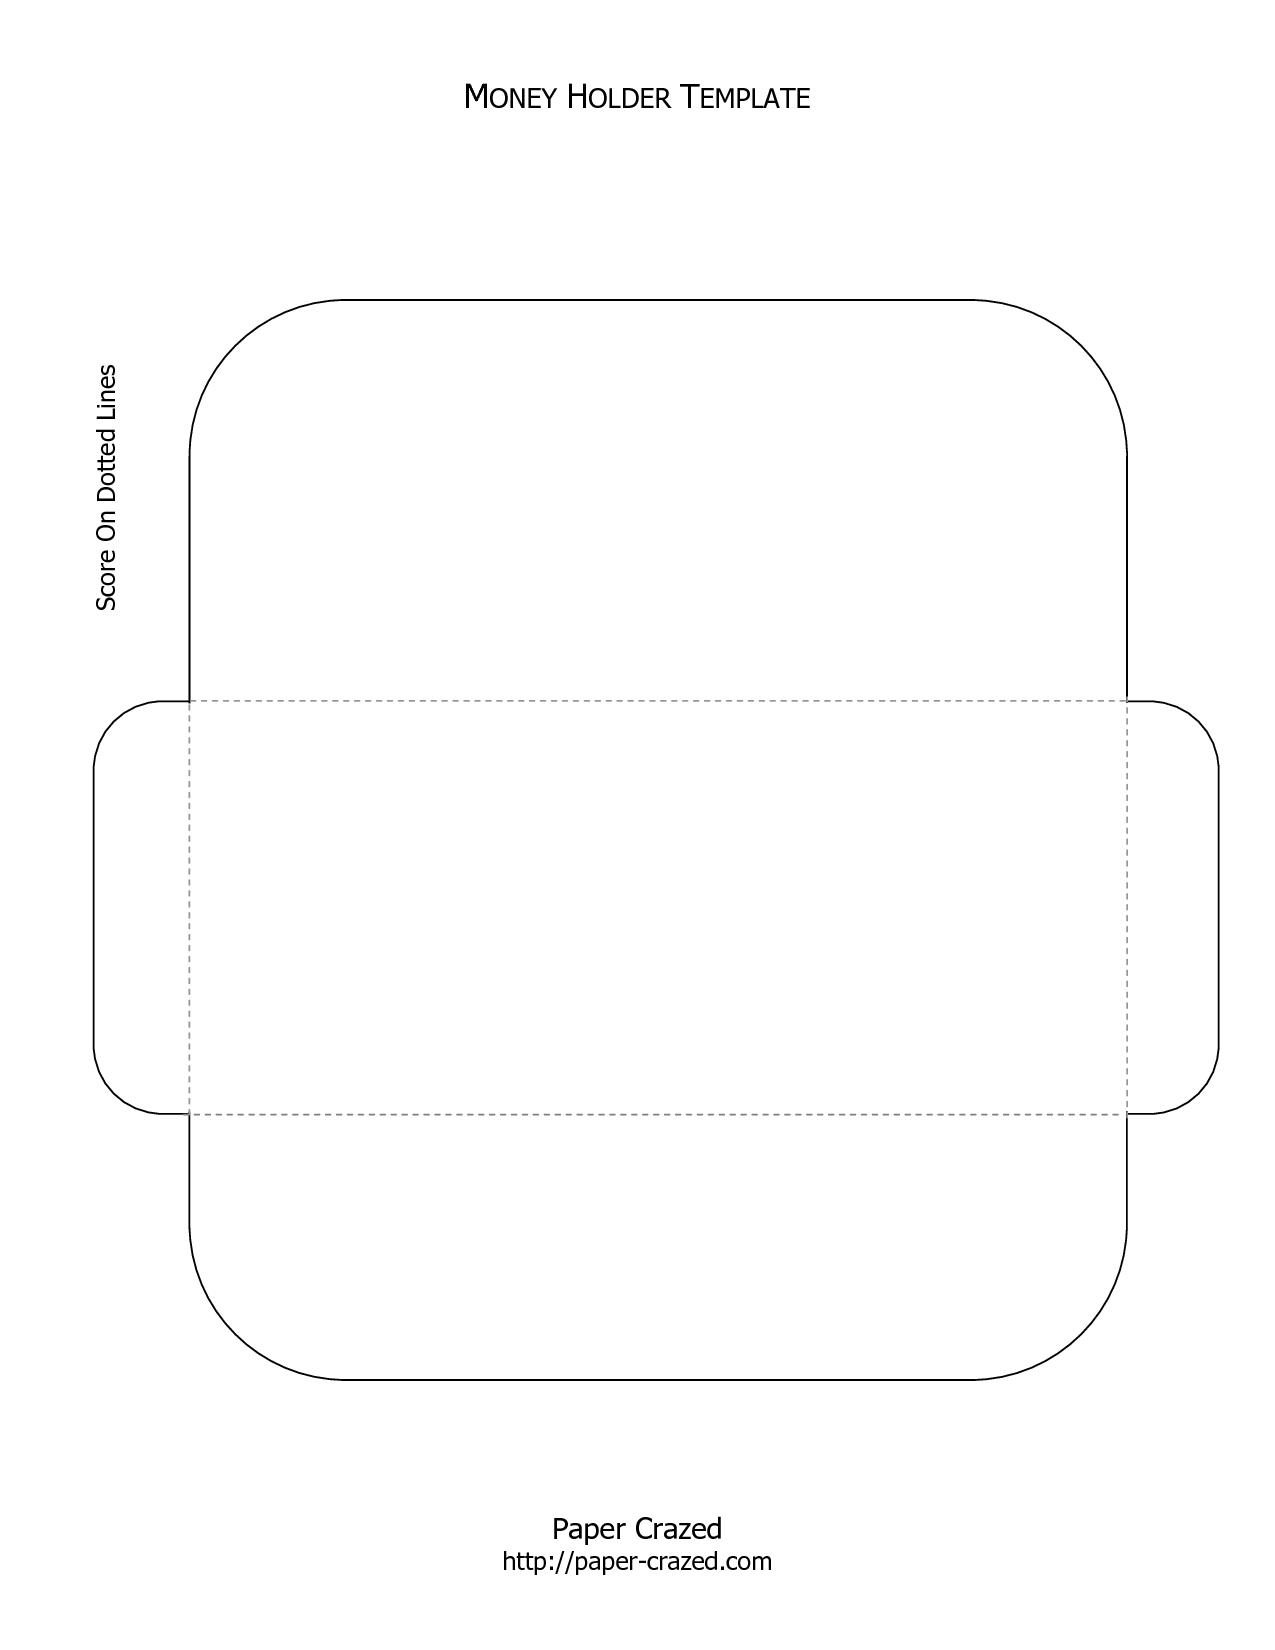 Envelope Gift Card Holder Template